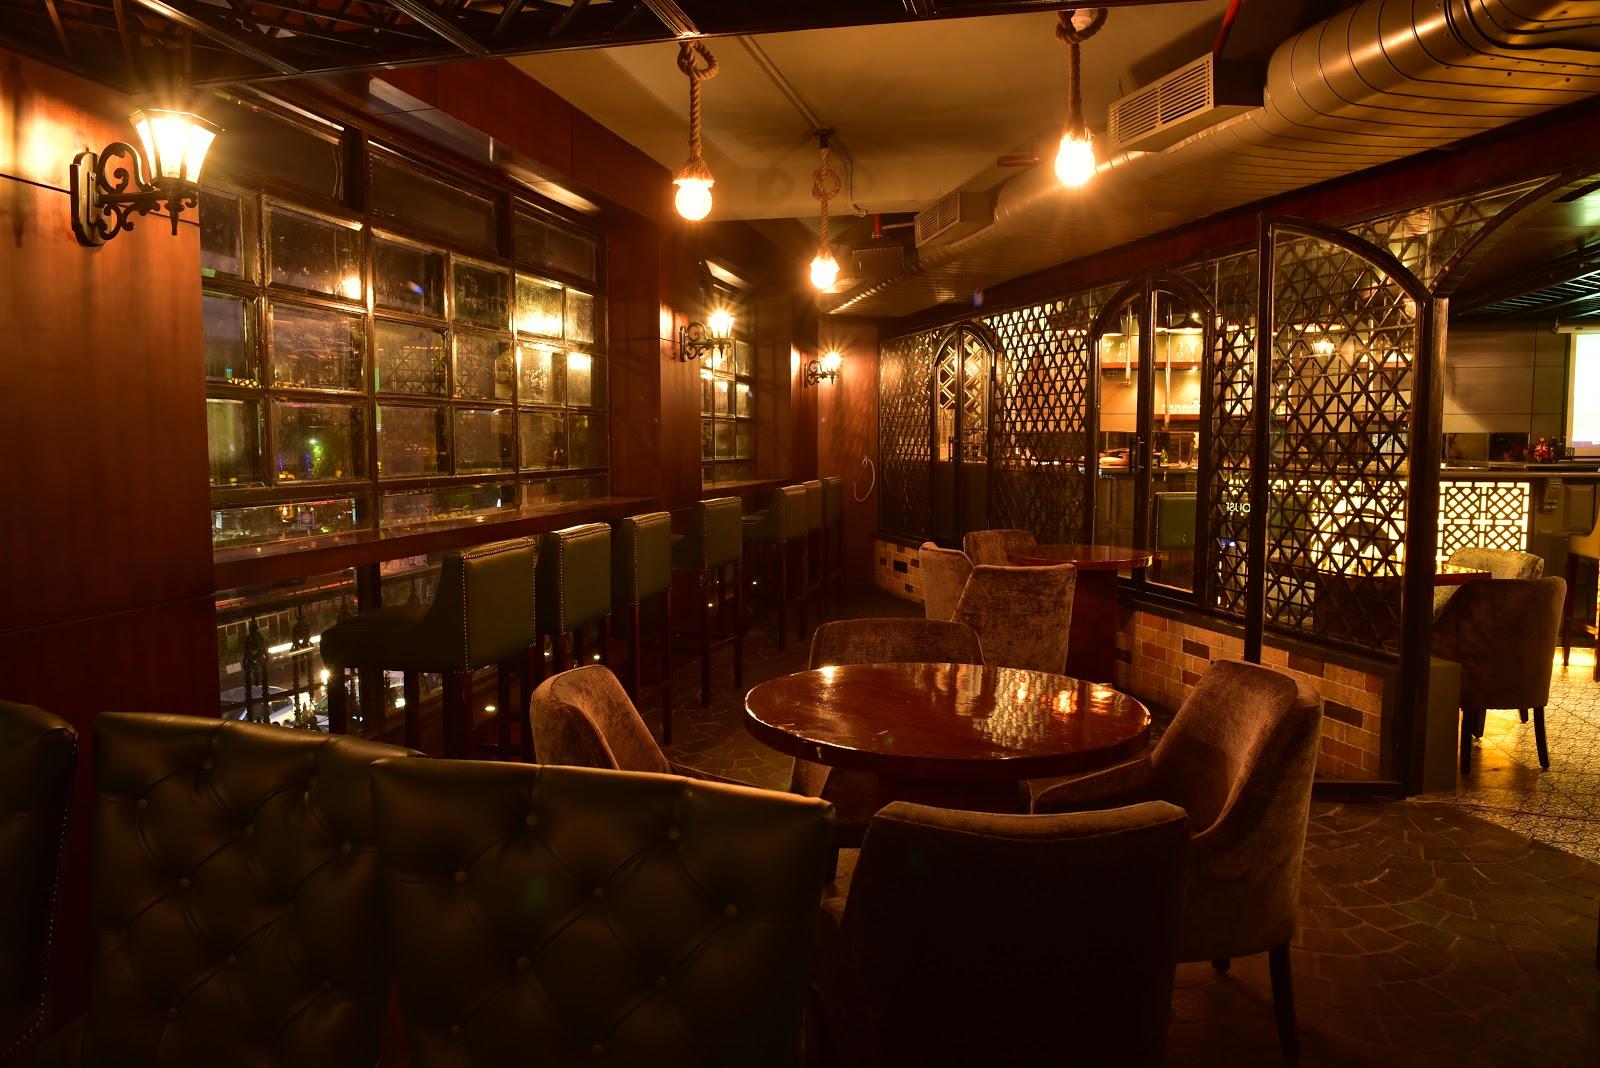 Meal-O-Drama Rajouri Garden, Delhi - Tushar Mangl